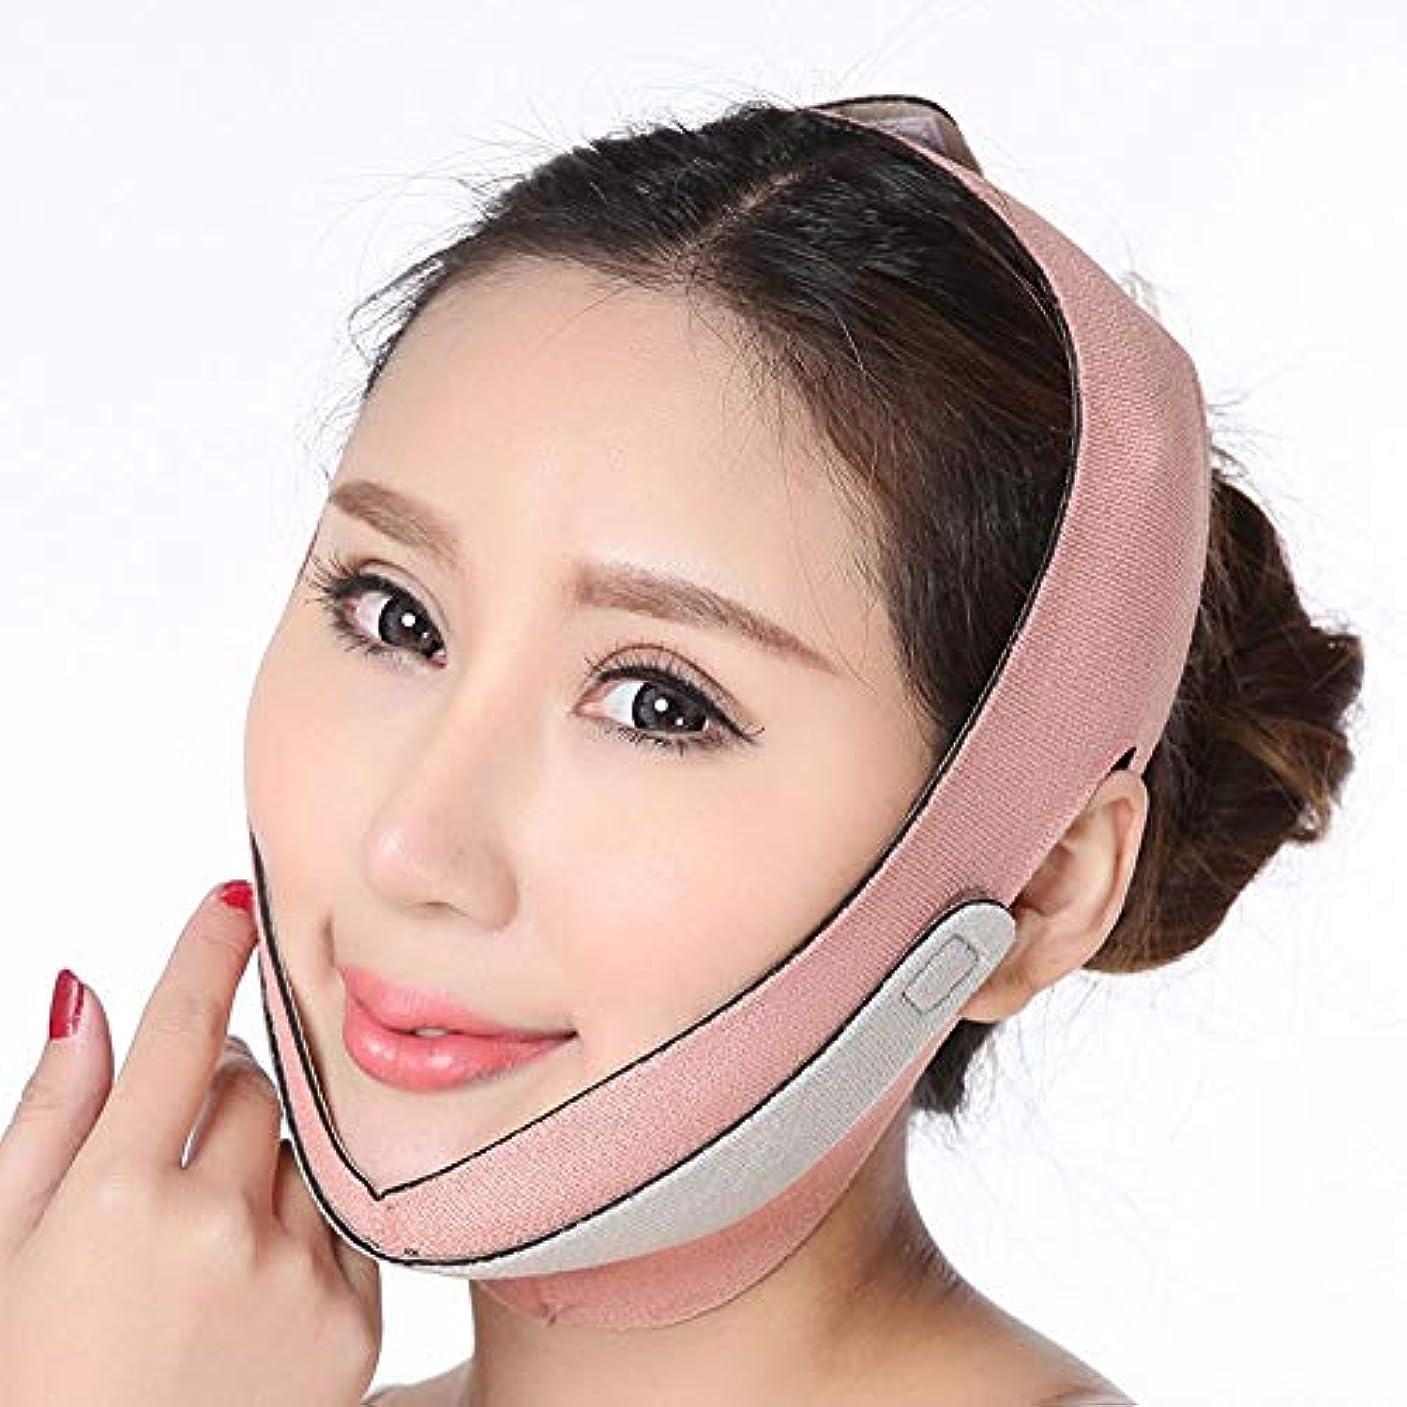 Minmin シンフェイス包帯シンフェイスマスクフェイスリフトアーティファクトレイズVフェイスシンフェイスフェイスリフティング美容マスク小フェイス包帯 みんみんVラインフェイスマスク (Color : A)